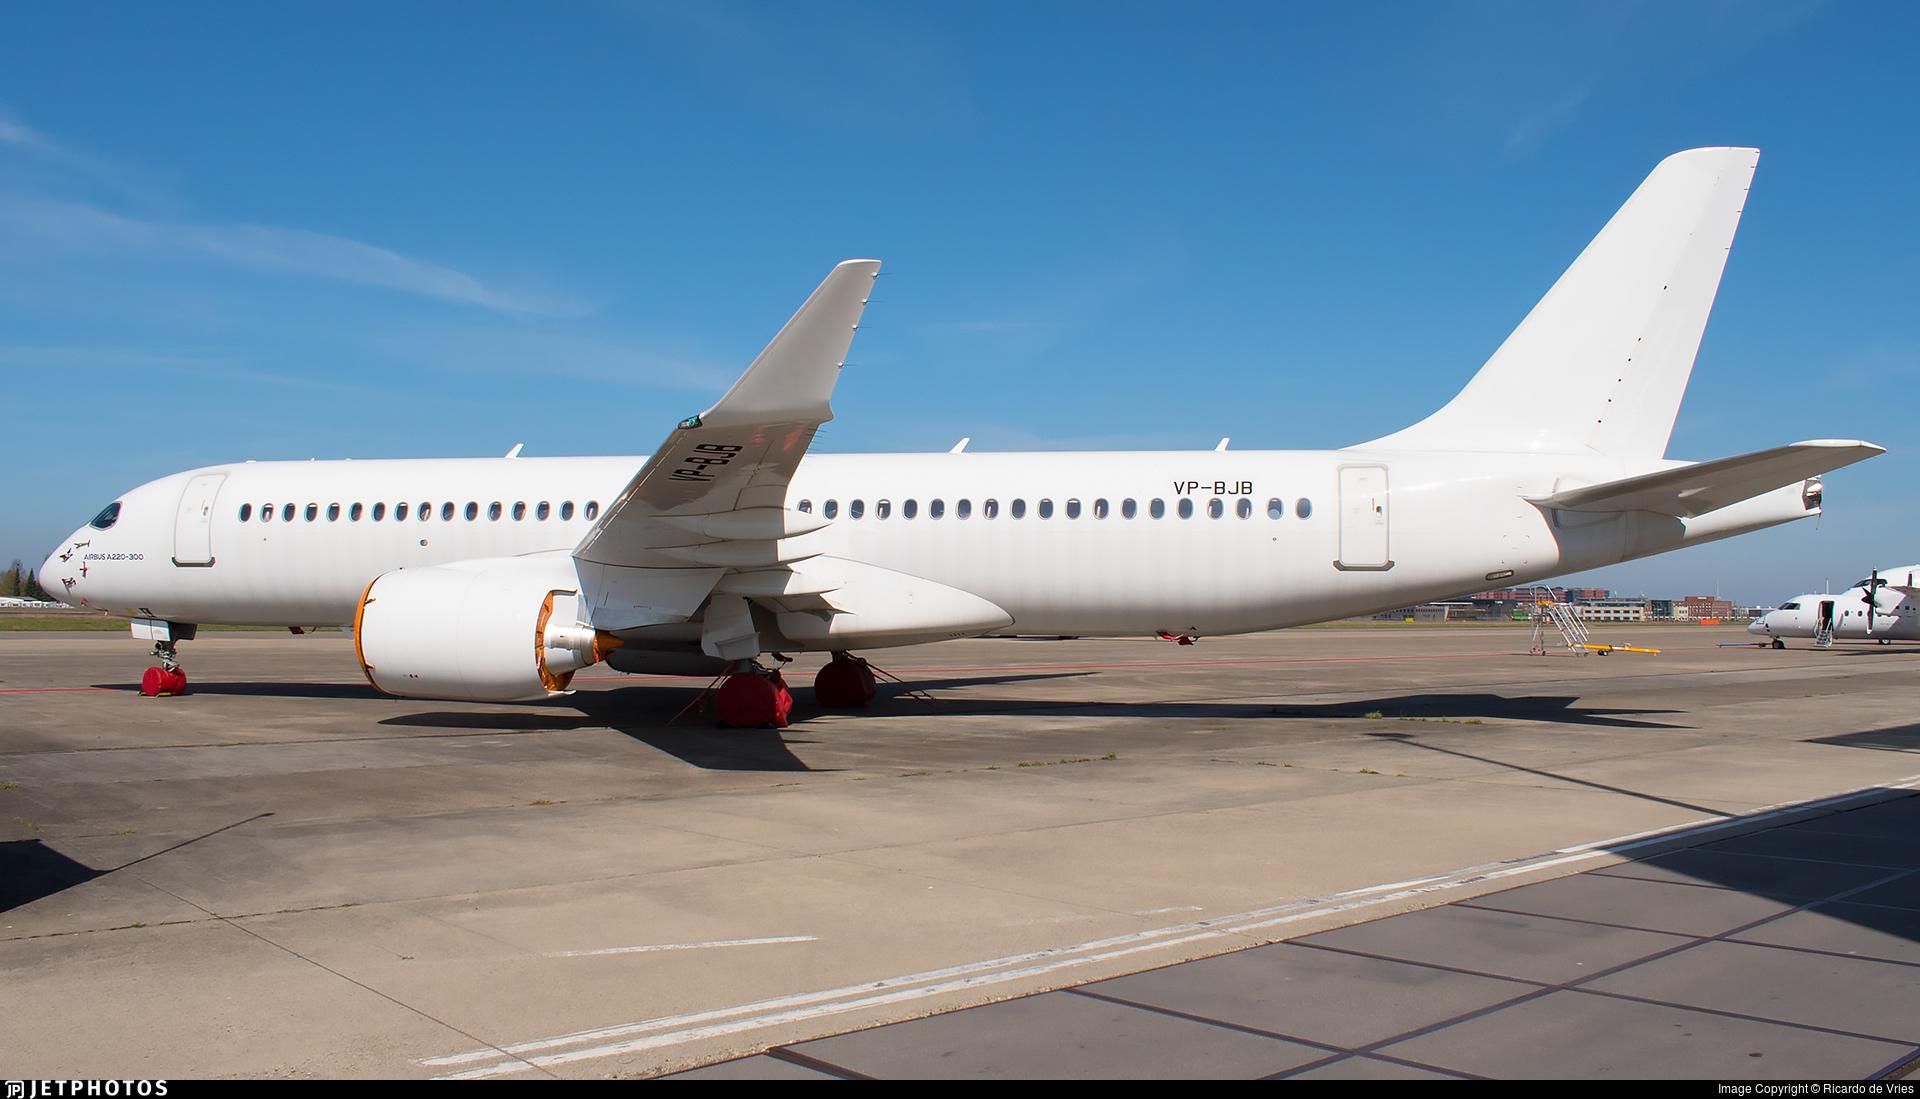 VP-BJB - Airbus A220-371 - Untitled